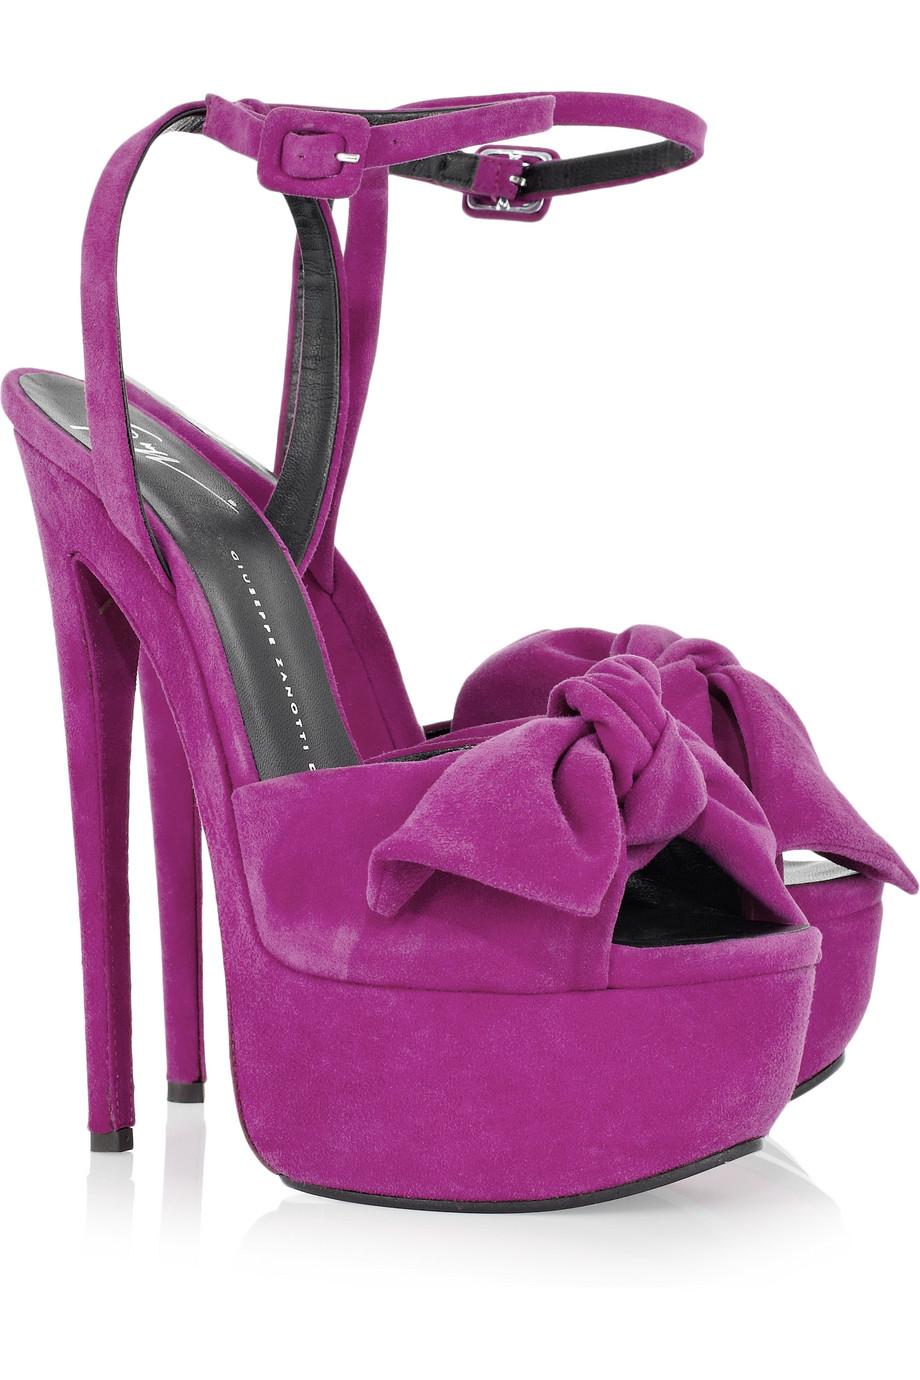 Giuseppe Zanotti Suede Bow Platform Sandals In Purple